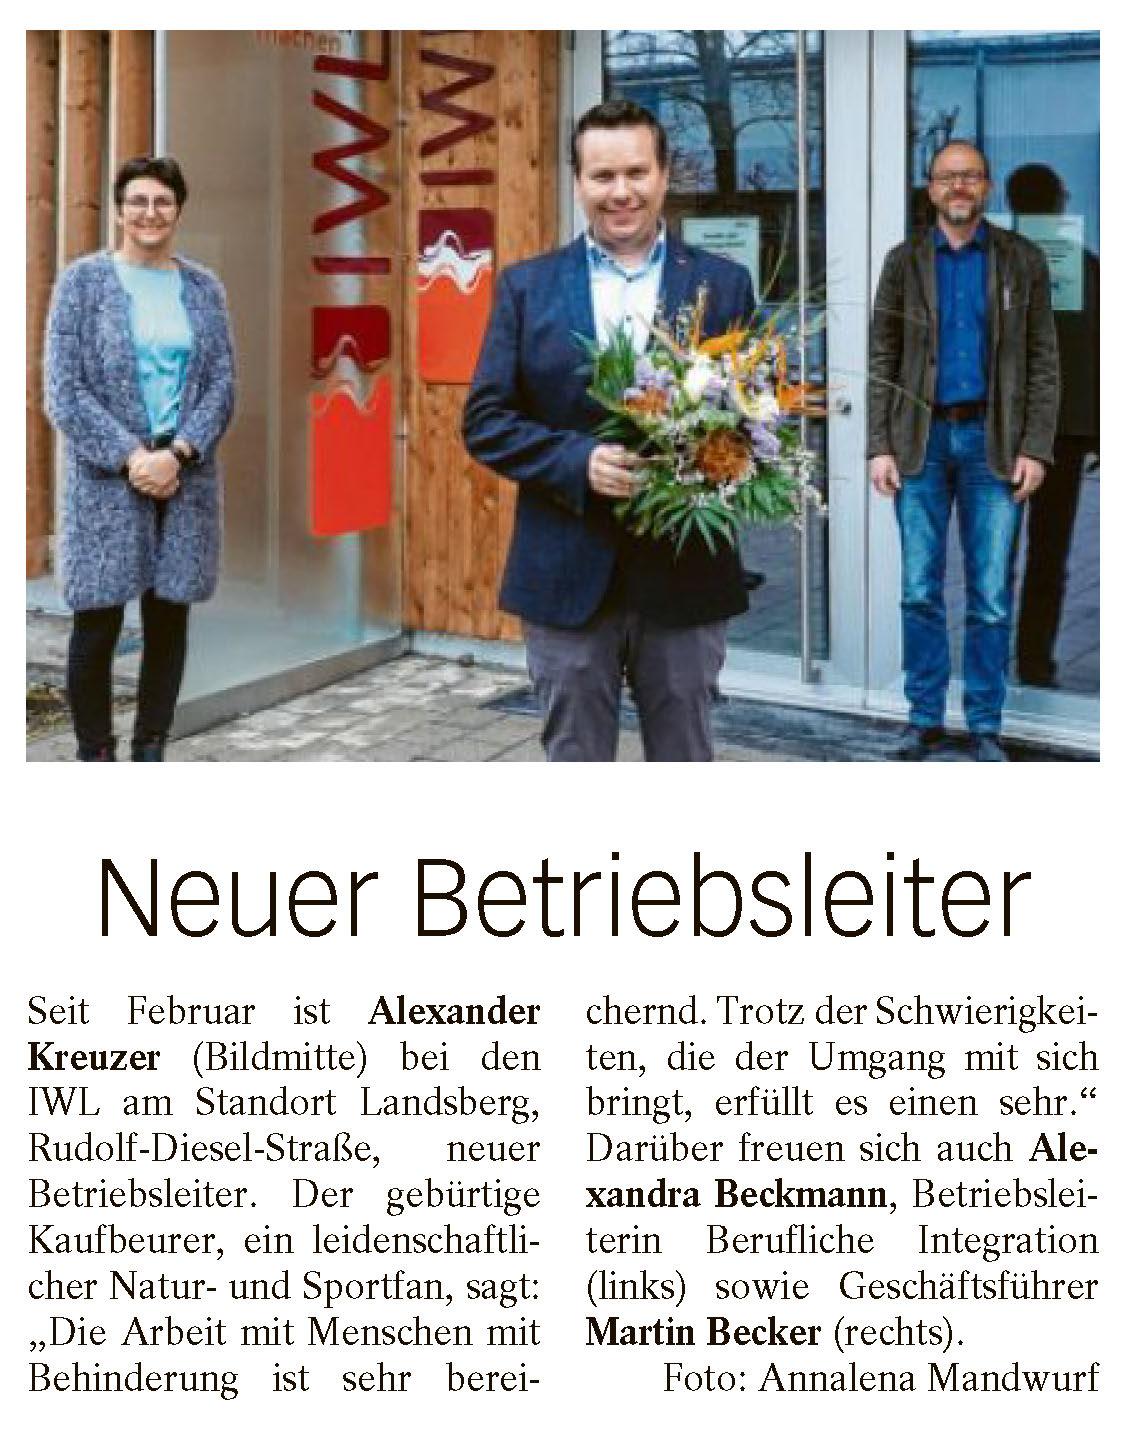 Neuer Betriebsleiter IWL Alexander Kreuzer